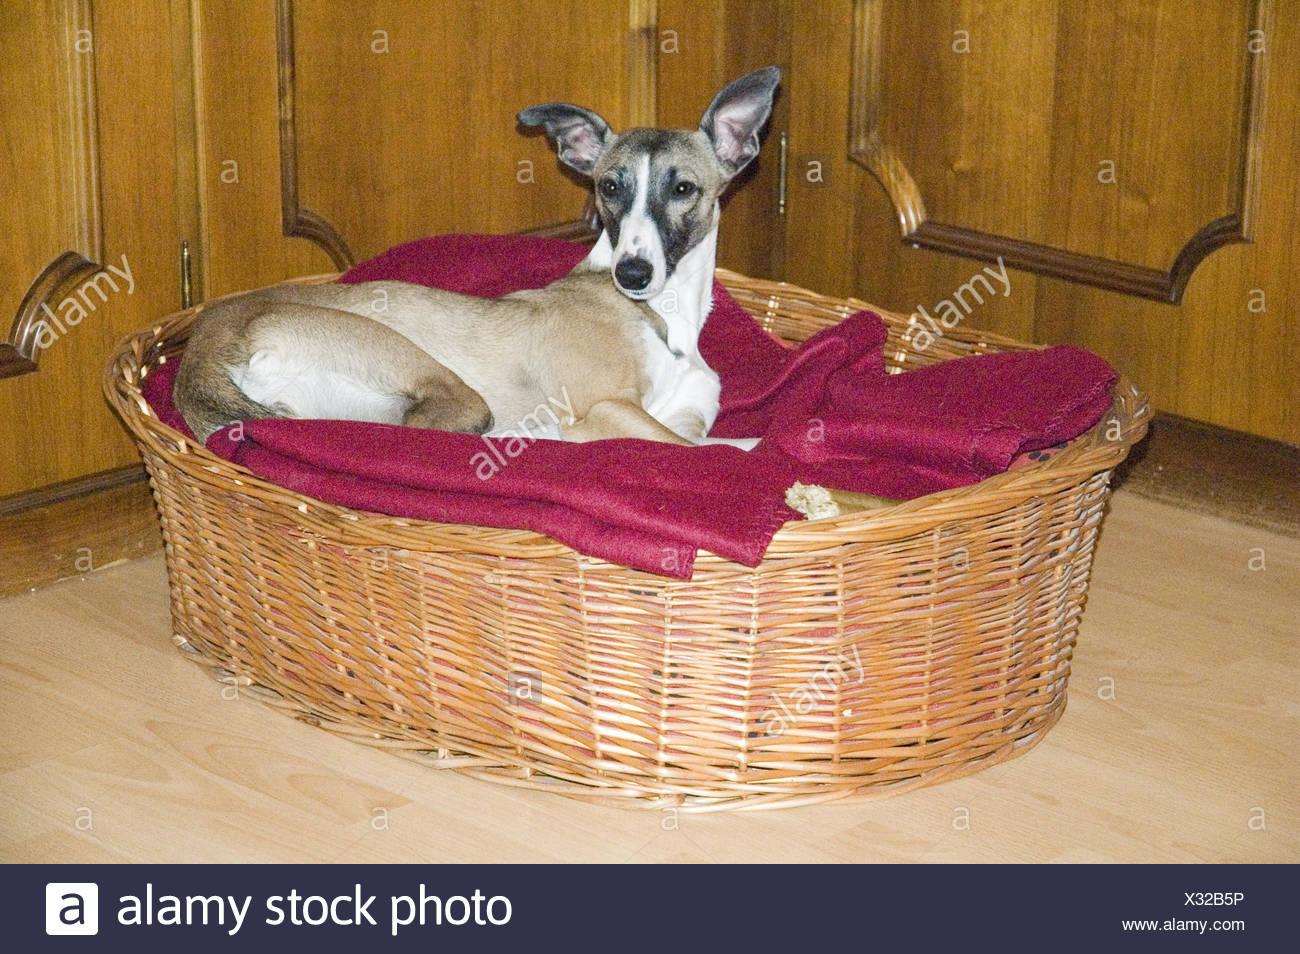 animal,pet,ears,dog,funny,greyhound,278,kurzhaar,whippet - Stock Image